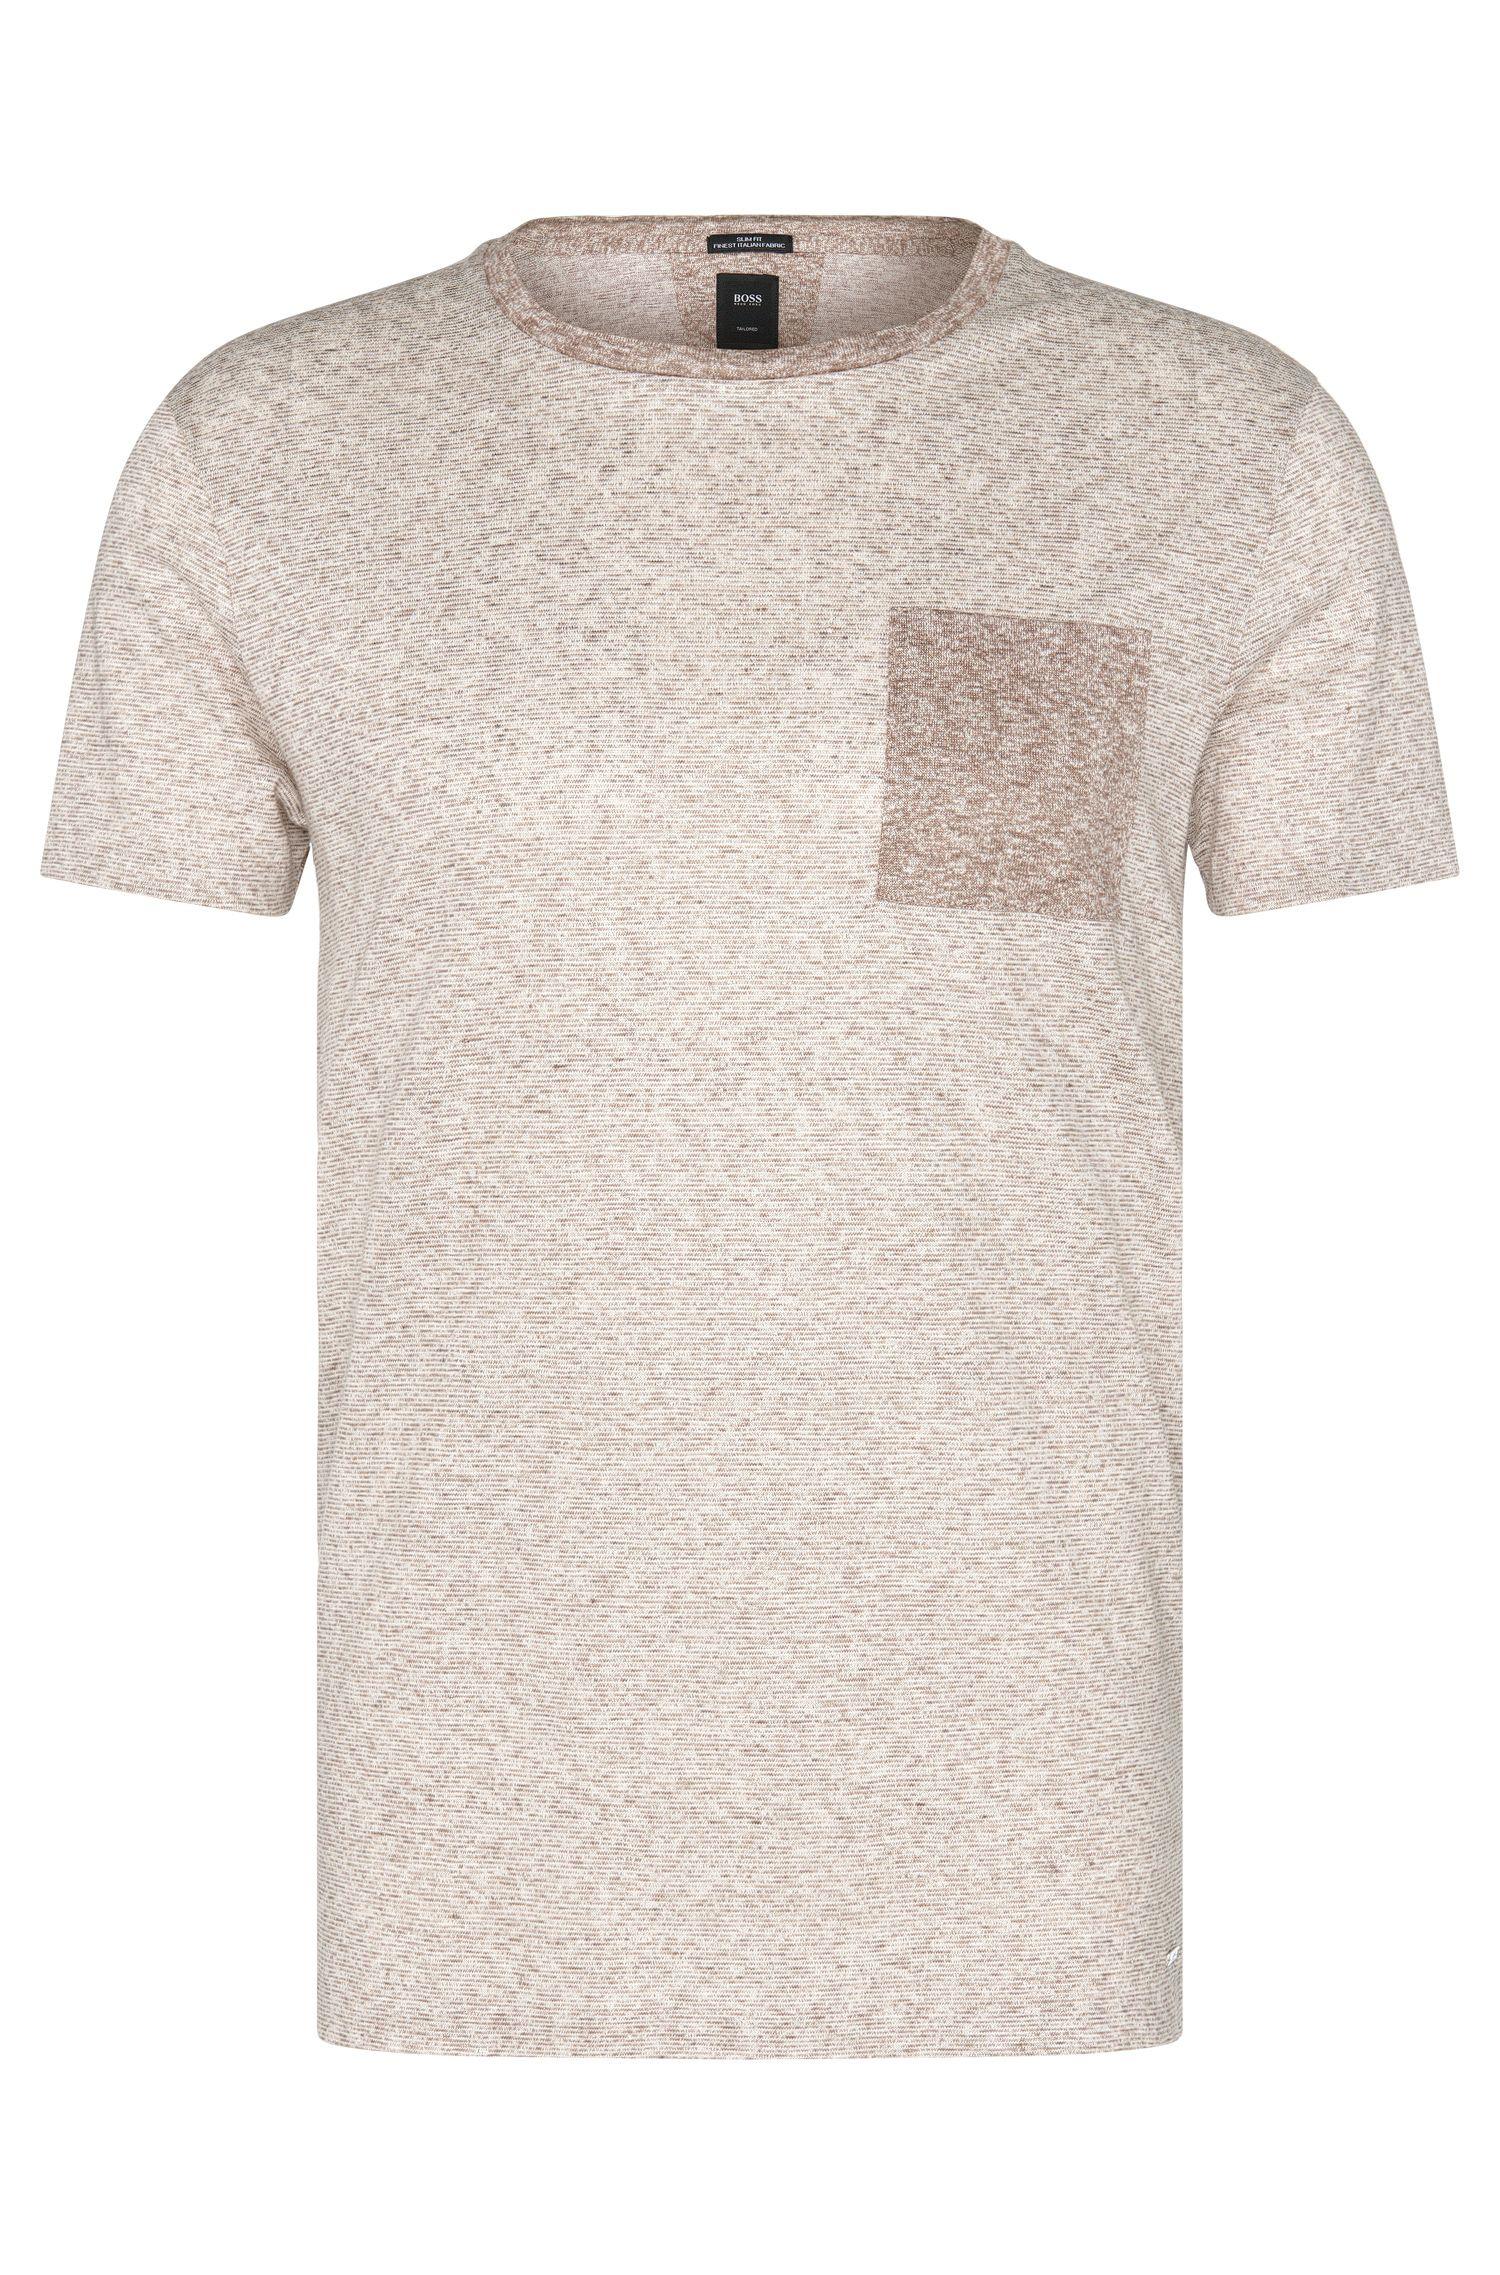 T-shirt Slim Fit Tailored à motif en lin: «T-Tribel 24»